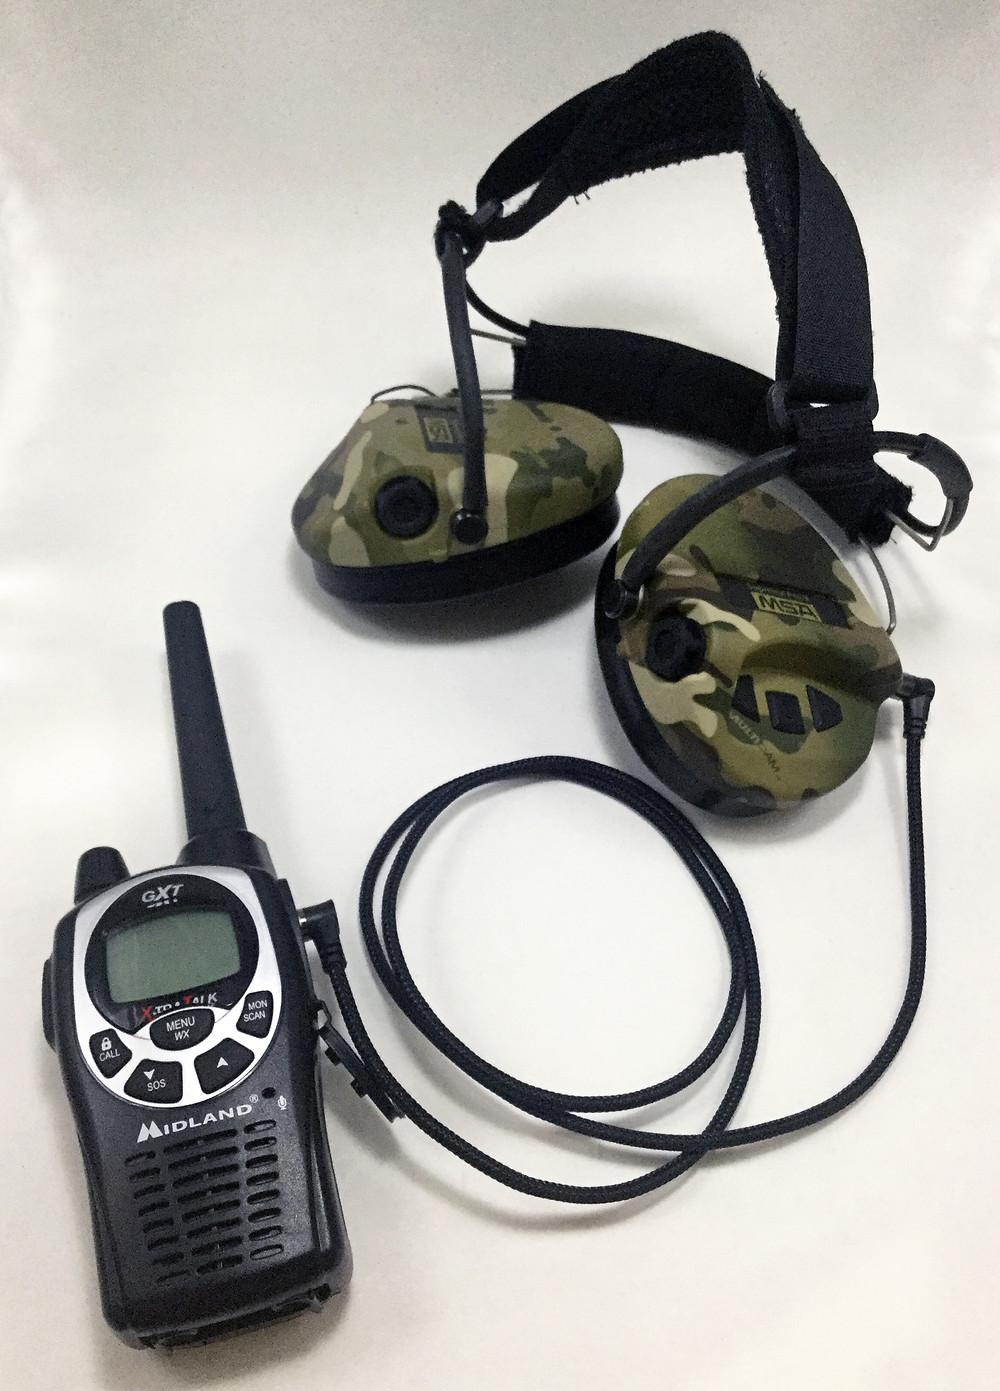 MSA Sordin headset with Midland GXT 1000 radio